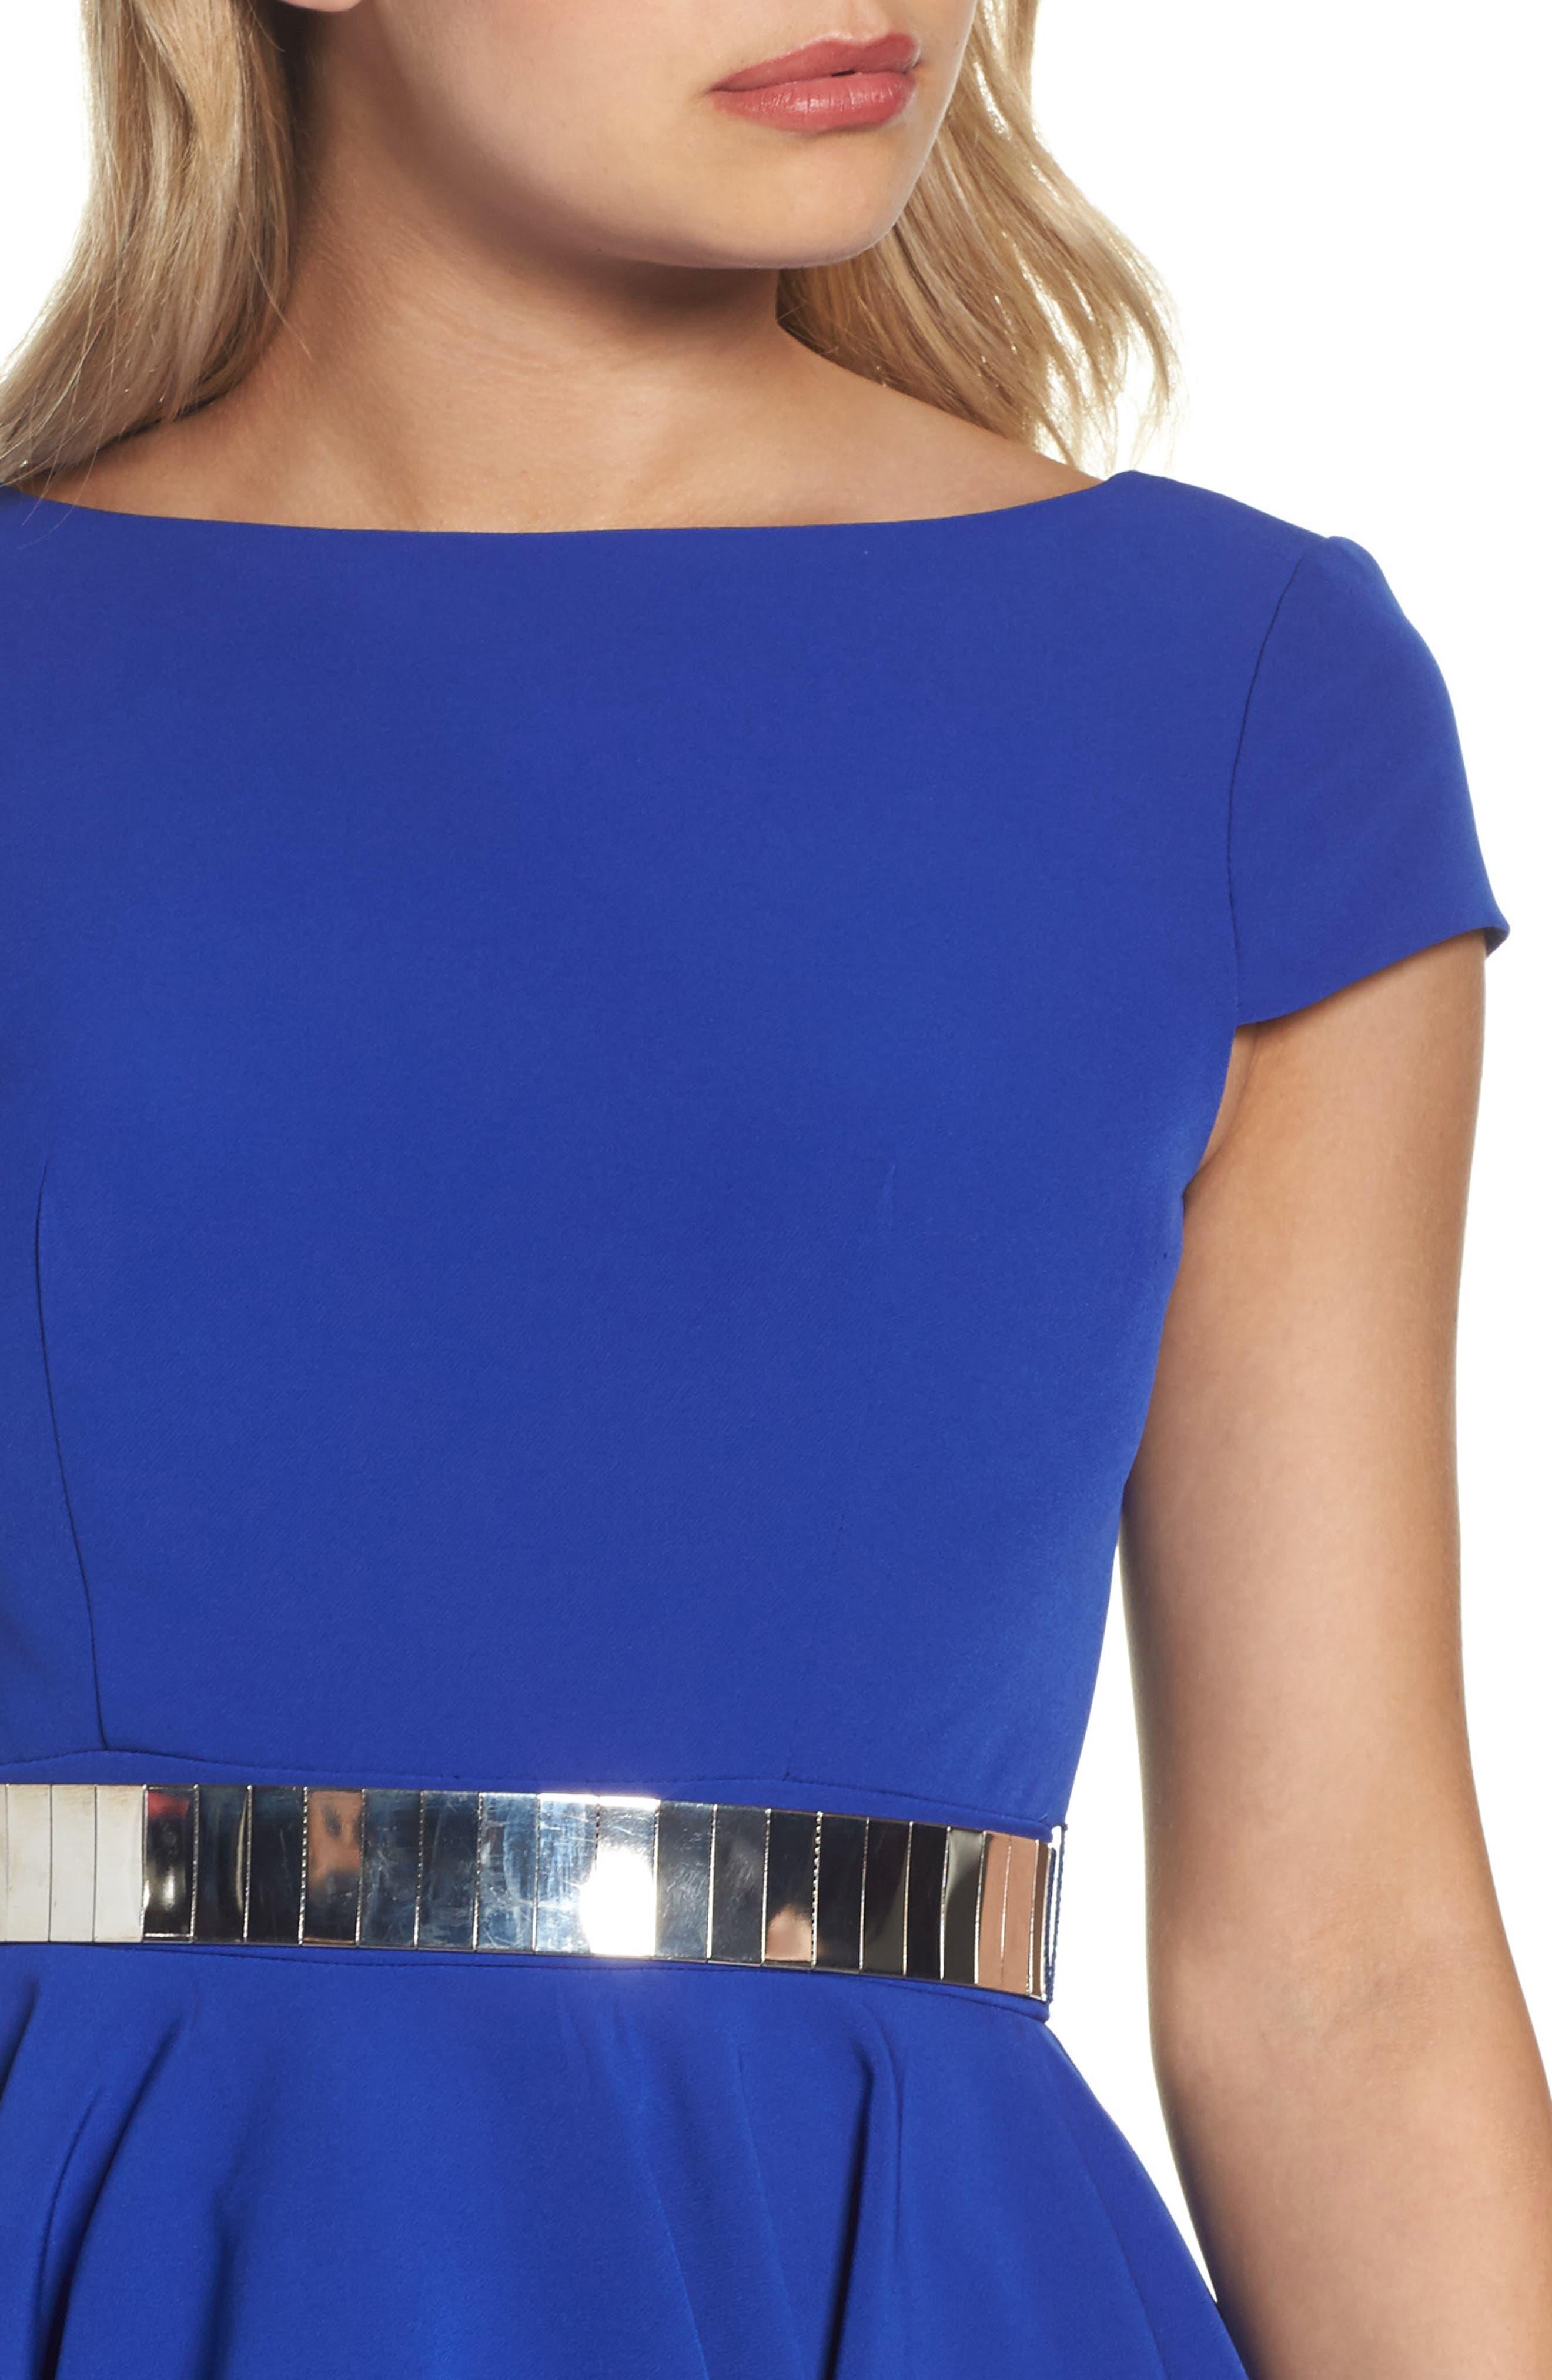 Belted Open Back Fit & Flare Dress,                             Alternate thumbnail 4, color,                             465